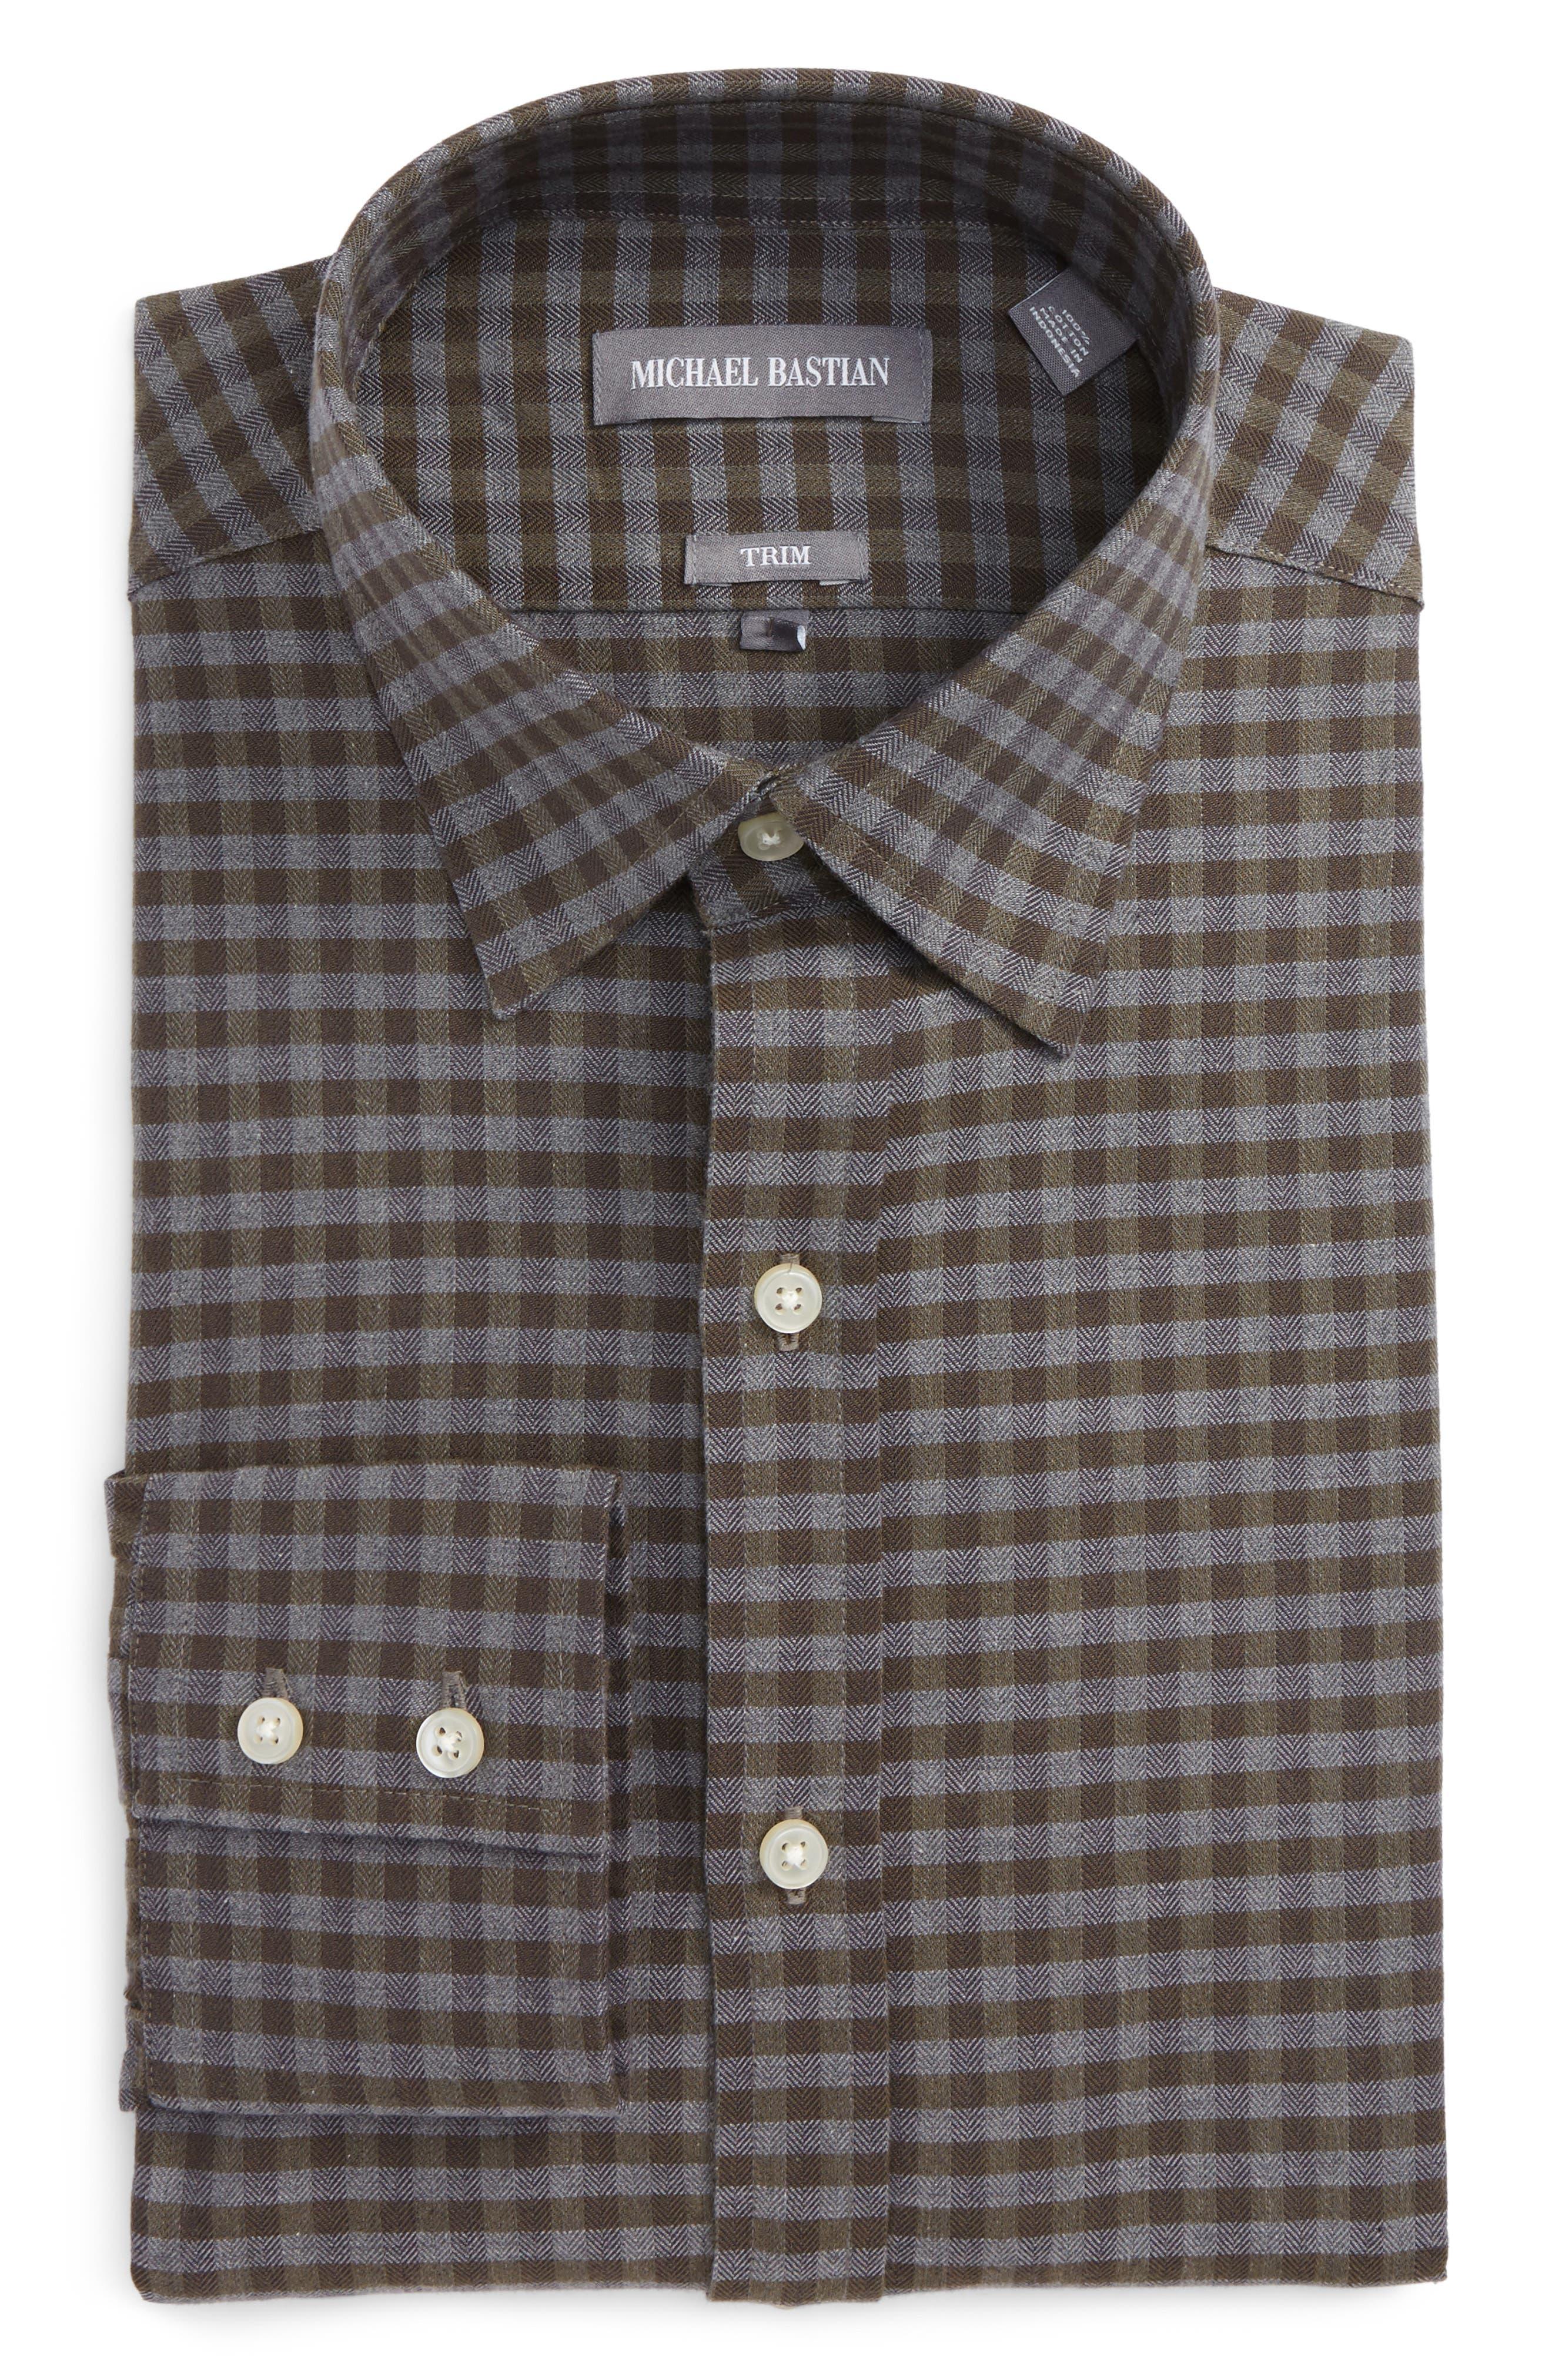 Main Image - Michael Bastian Trim Fit Check Dress Shirt